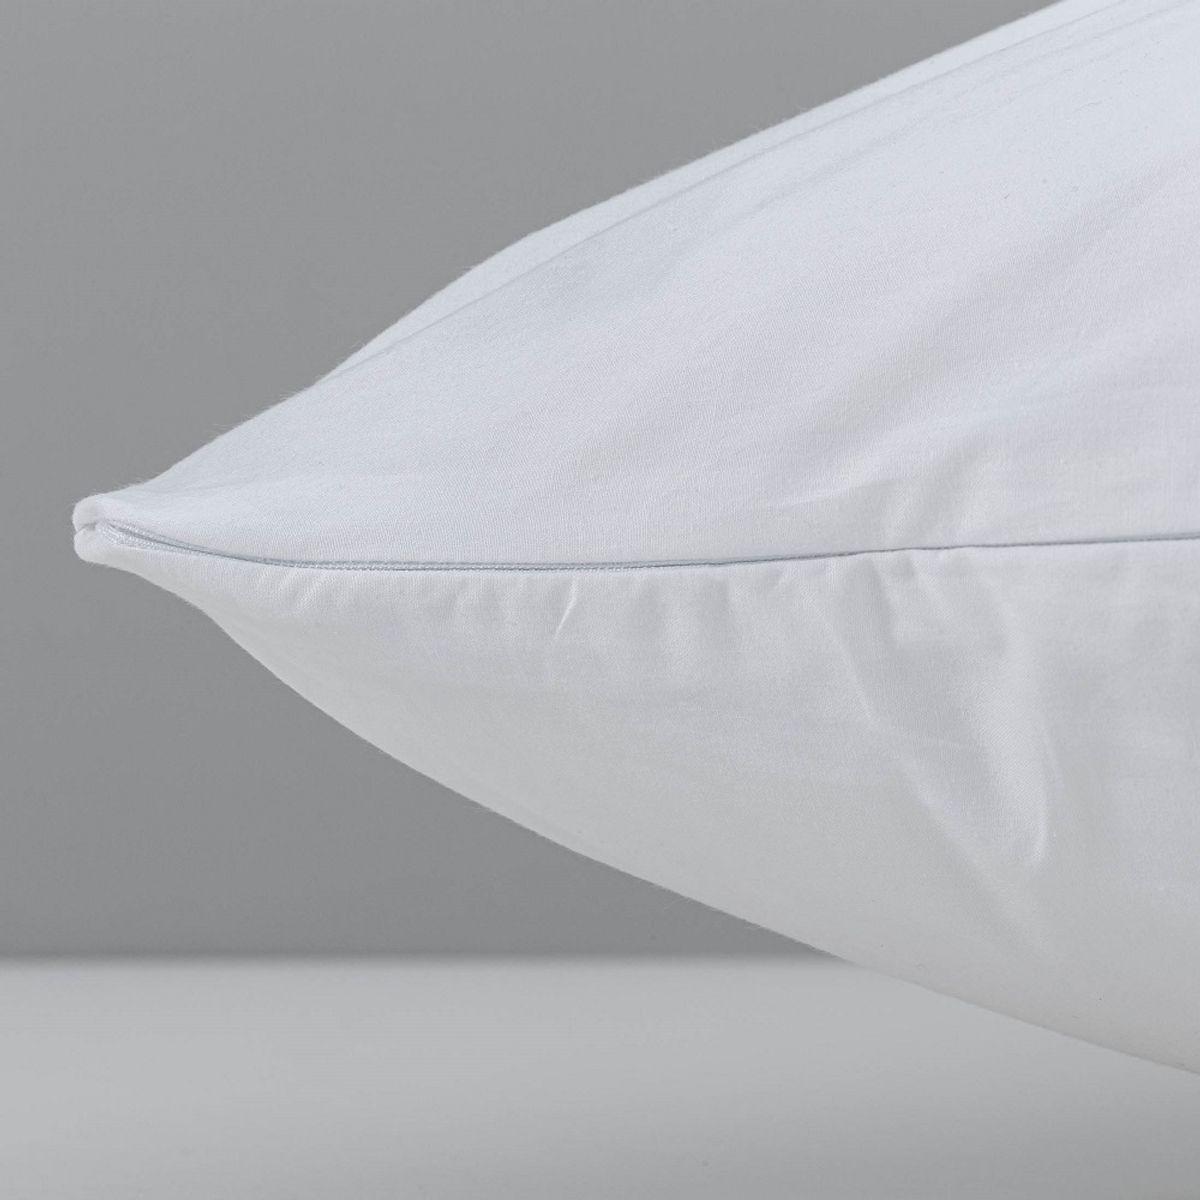 protetor-de-travesseiro-branco-liso-artelasse-1